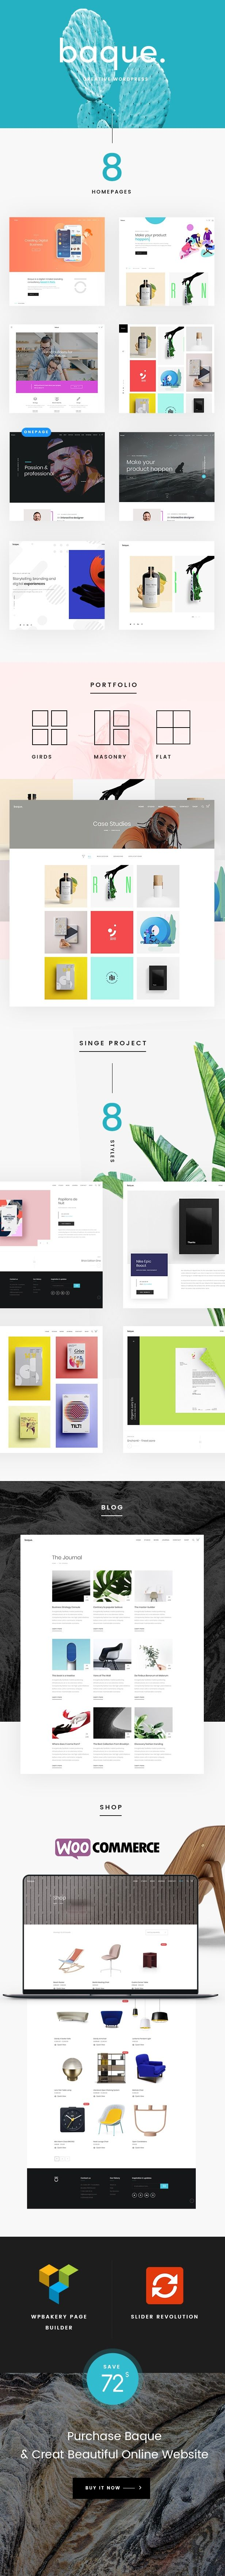 Baque - Multipurpose Onepage Creative WP Theme - 1